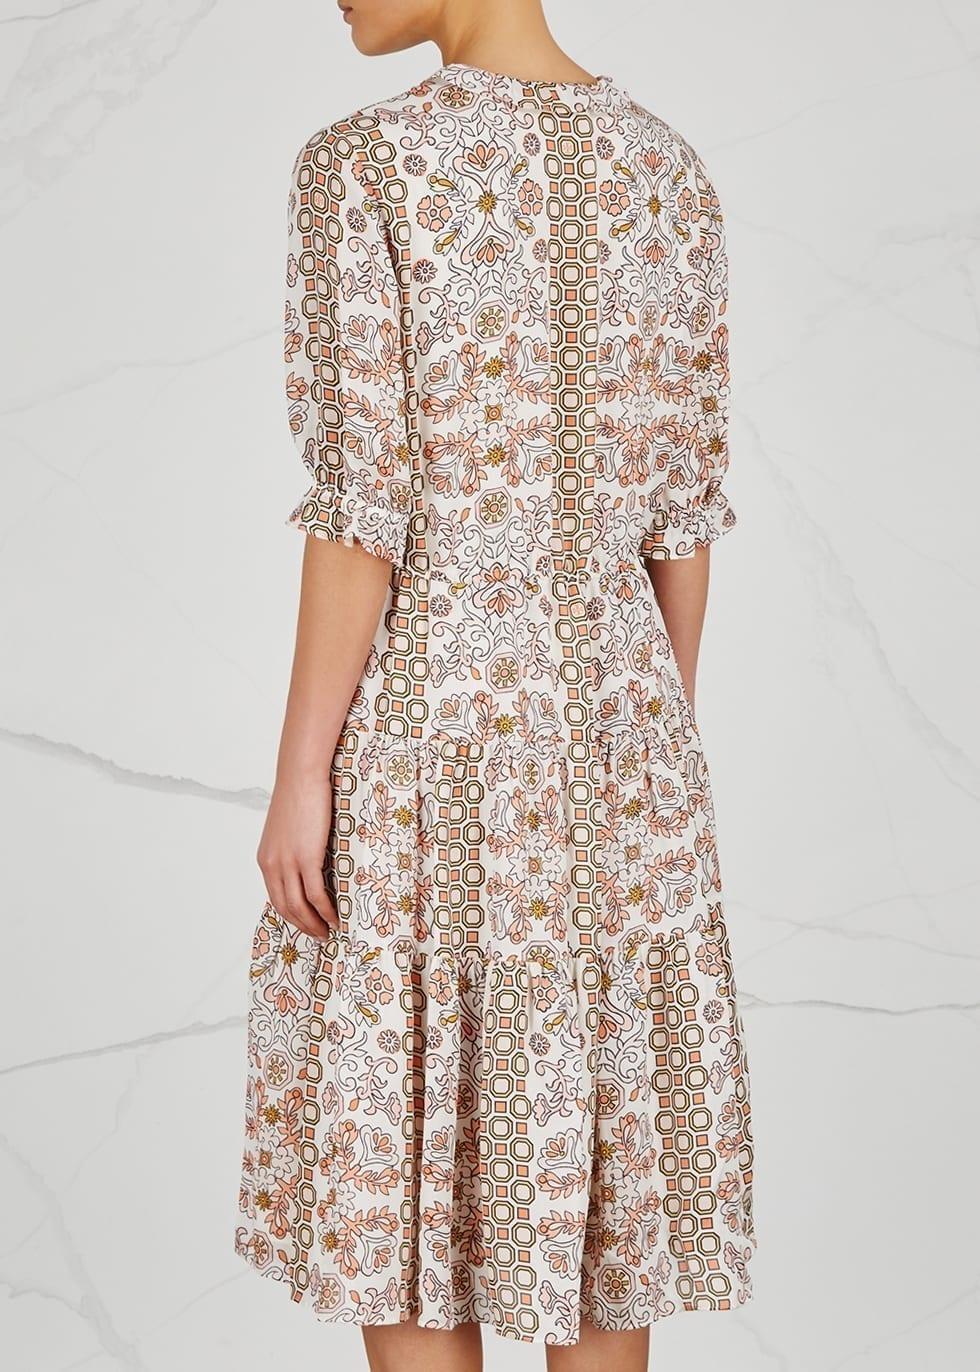 4910df7726526e TORY BURCH Serena Silk Chiffon Ivory   Floral Printed Dress - We ...